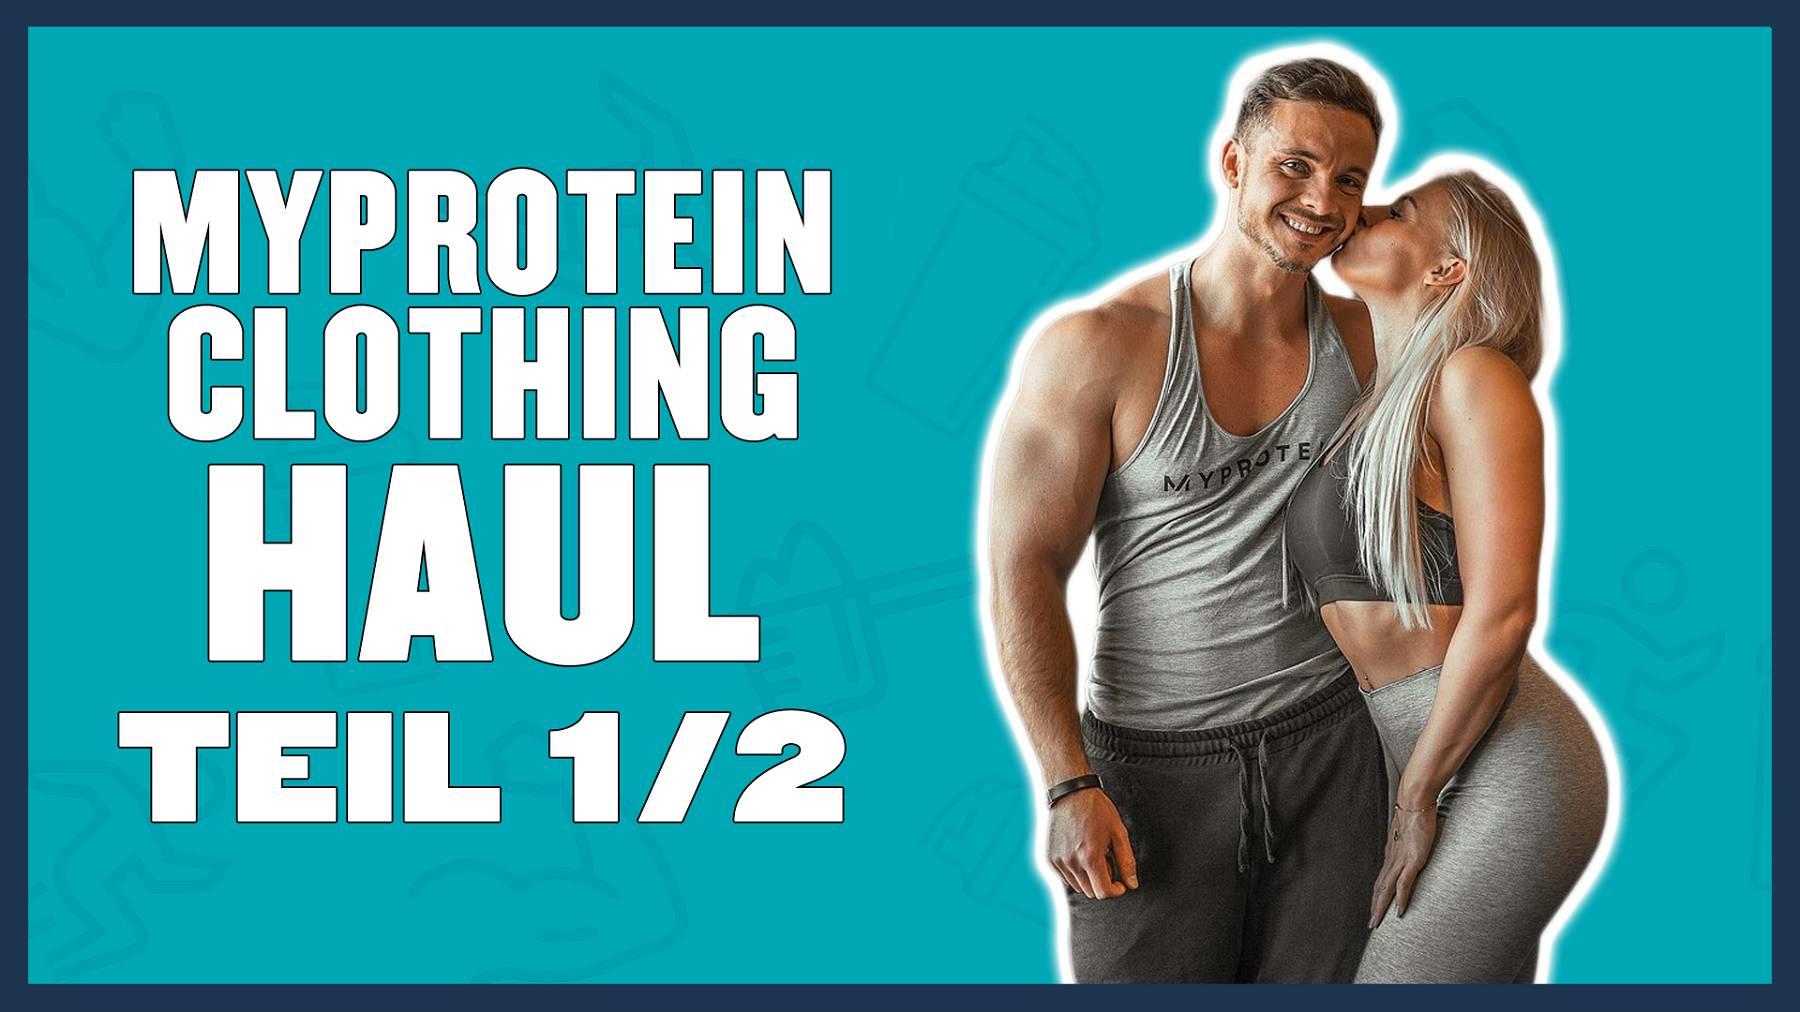 Myprotein Clothing Haul - Teil 1   Top 5 Damen Outfits fürs Training mit Oskar & Mandy